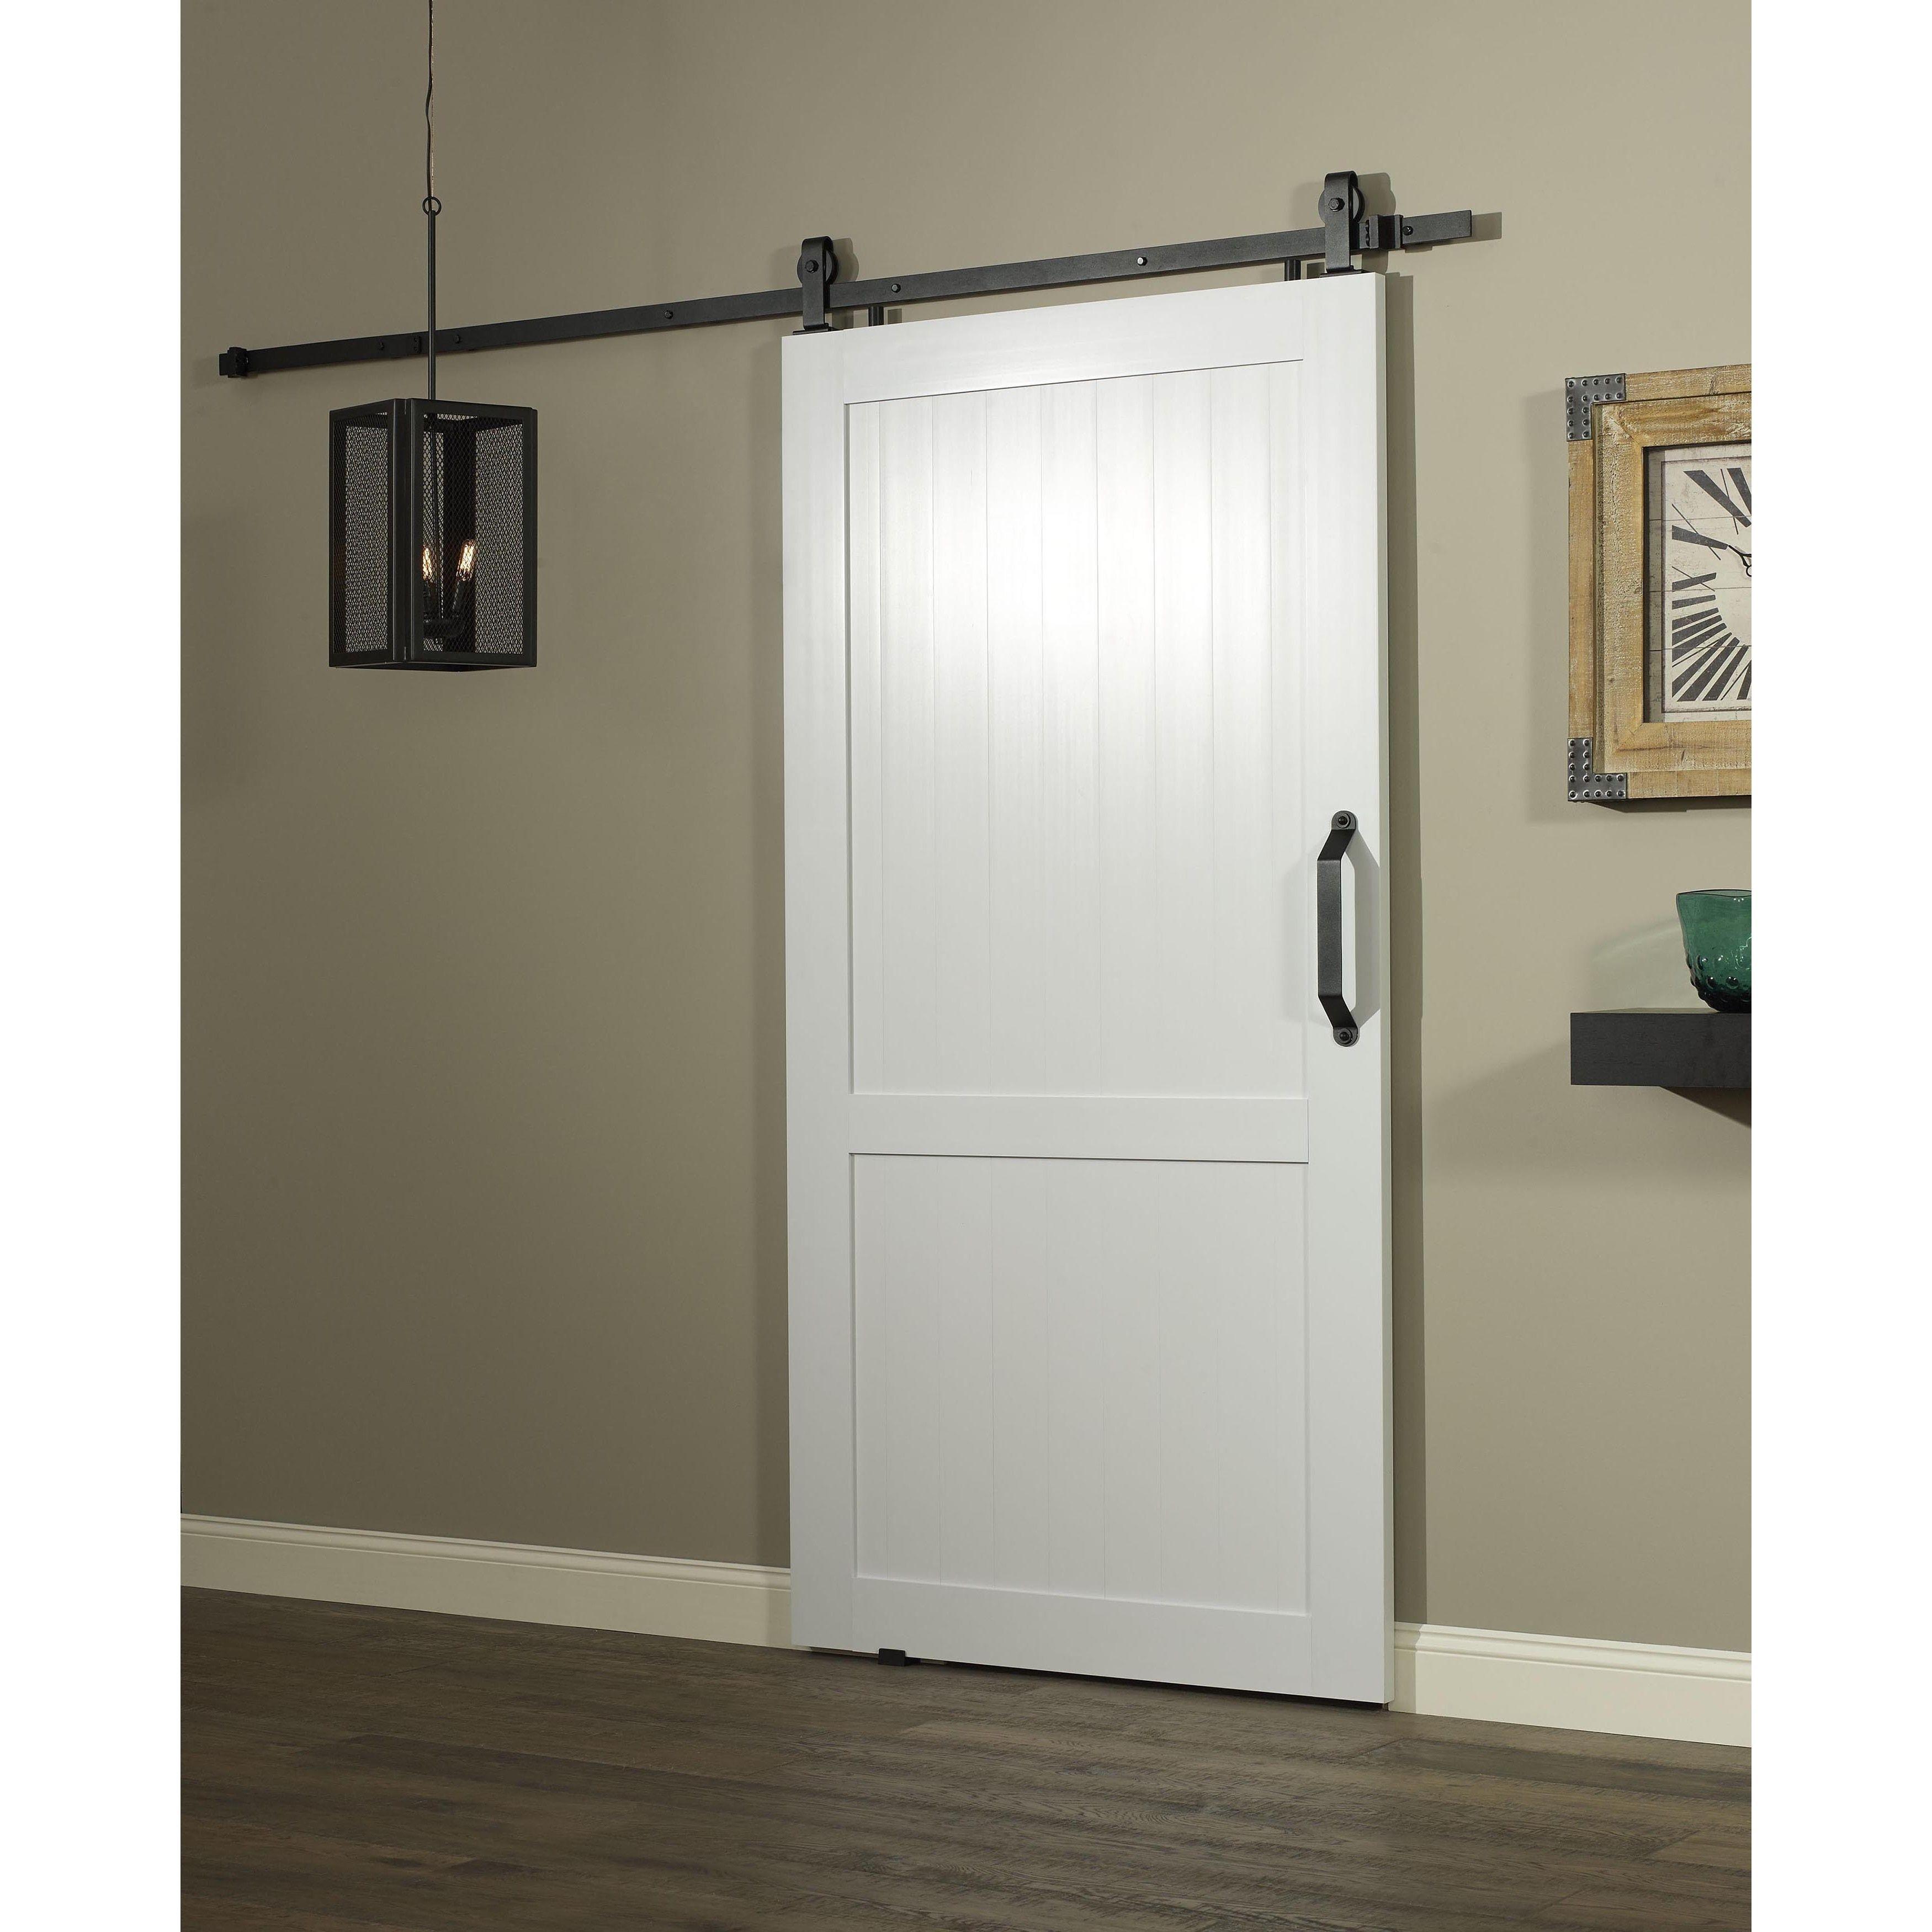 Overstock Com Online Shopping Bedding Furniture Electronics Jewelry Clothing More Wood Doors Interior Sliding Barn Door Hardware Sliding Doors Interior